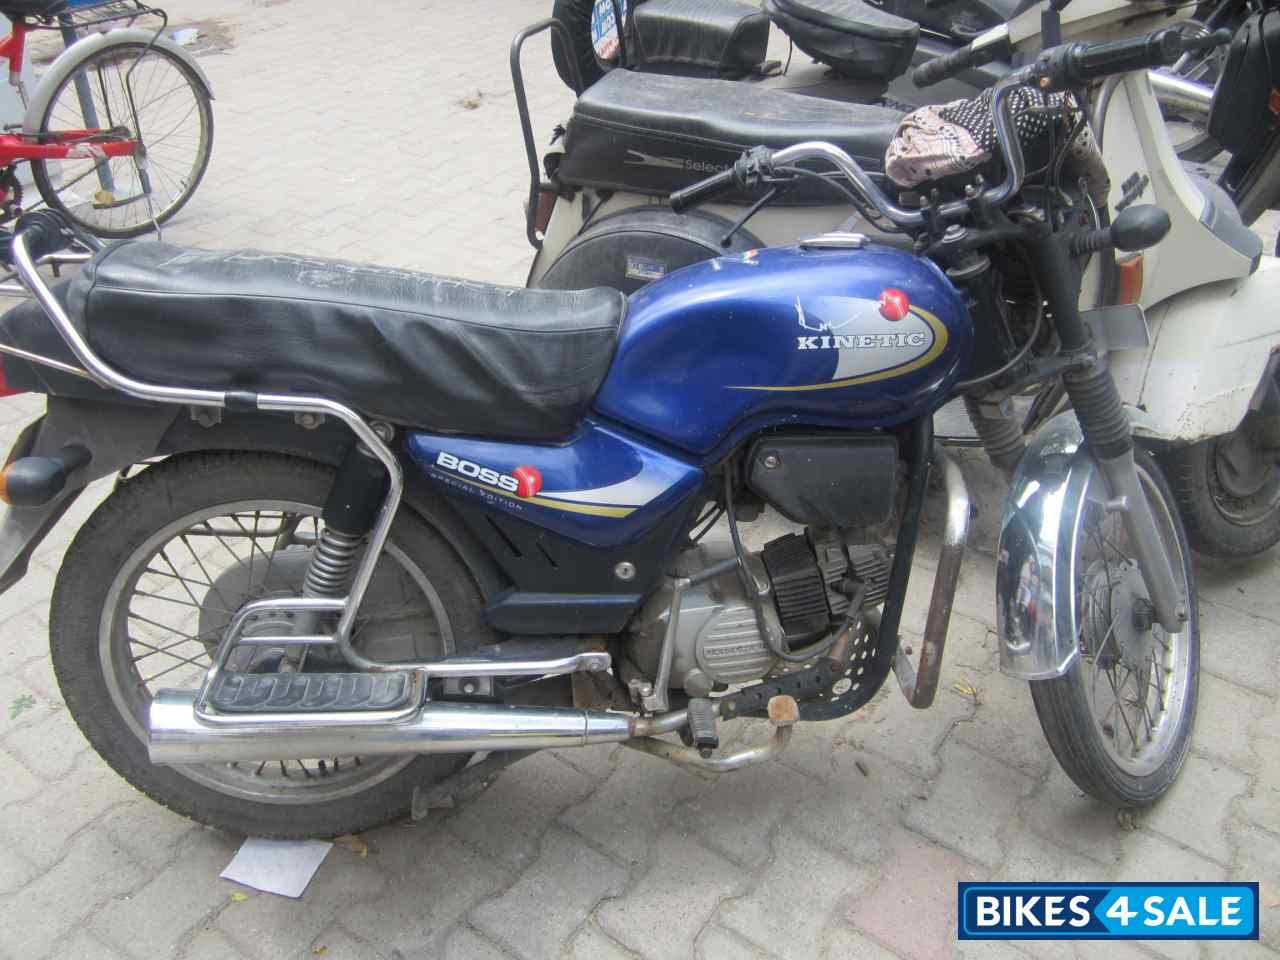 9f0d3f2ca73 Kinetic Boss 115 Picture 1. Bike ID 72291. Bike located in New Delhi ...